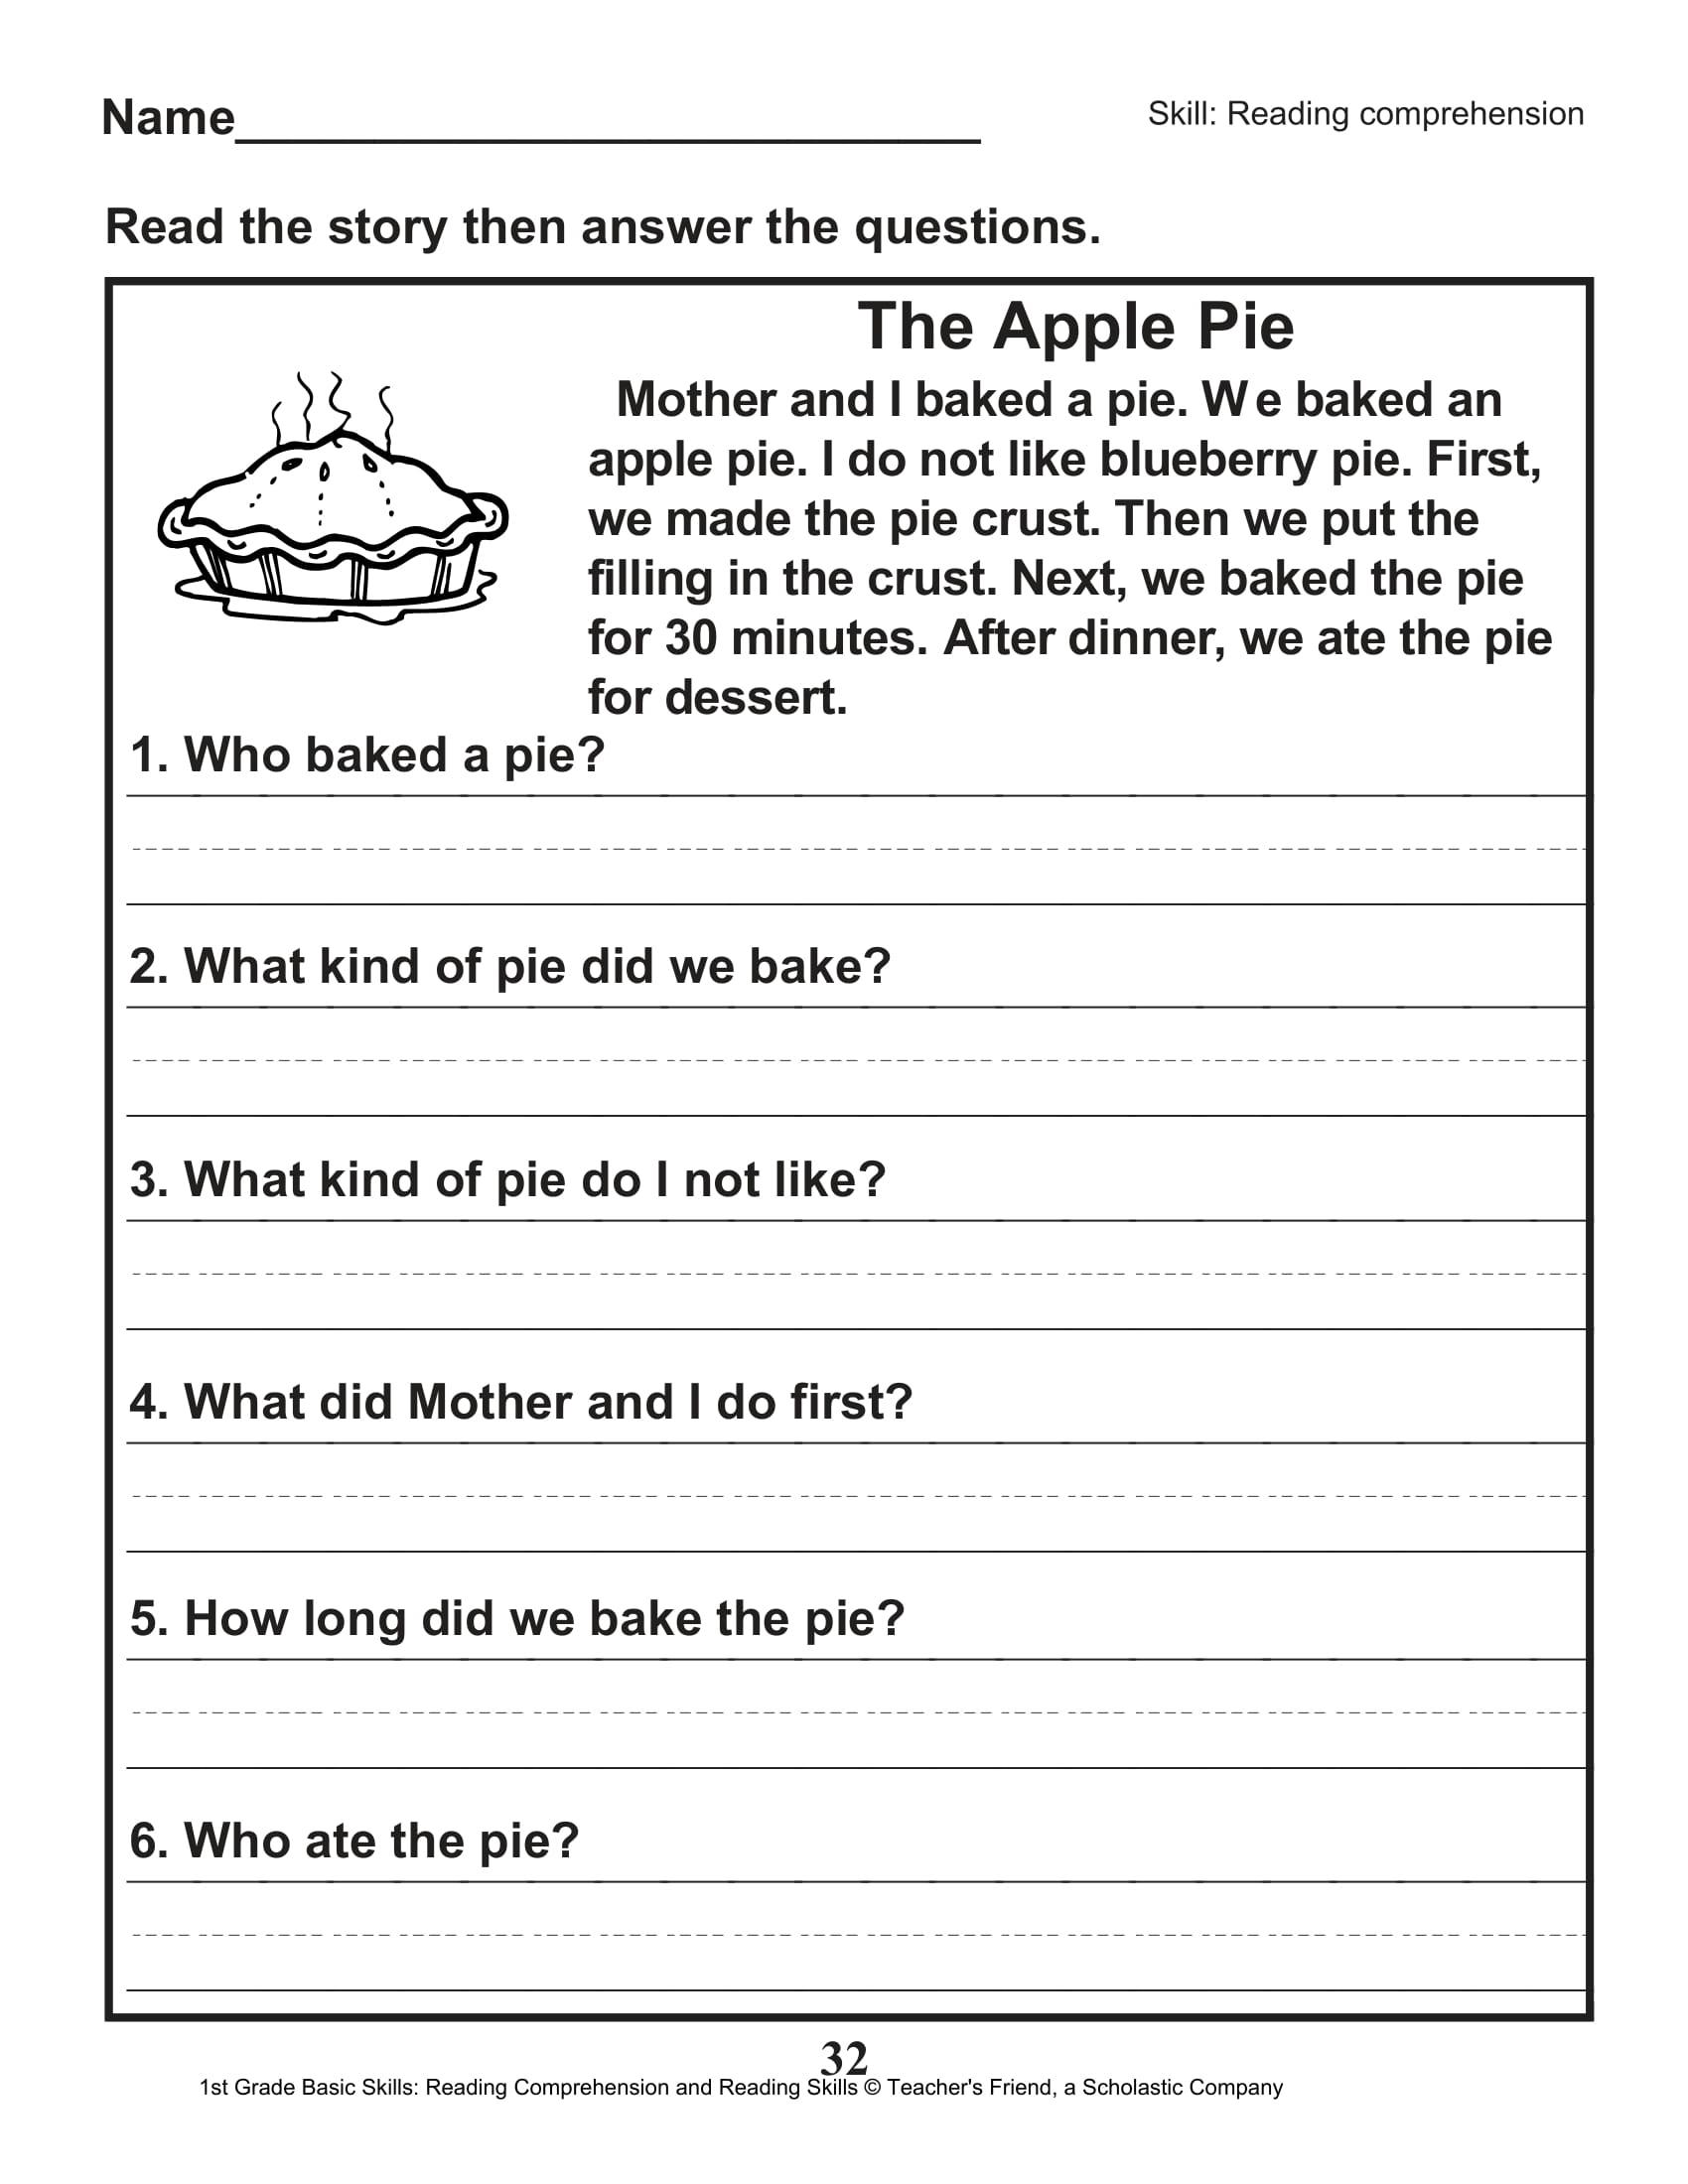 Scholastic 1st Grade Reading Comprehension Skills Worksheets 33